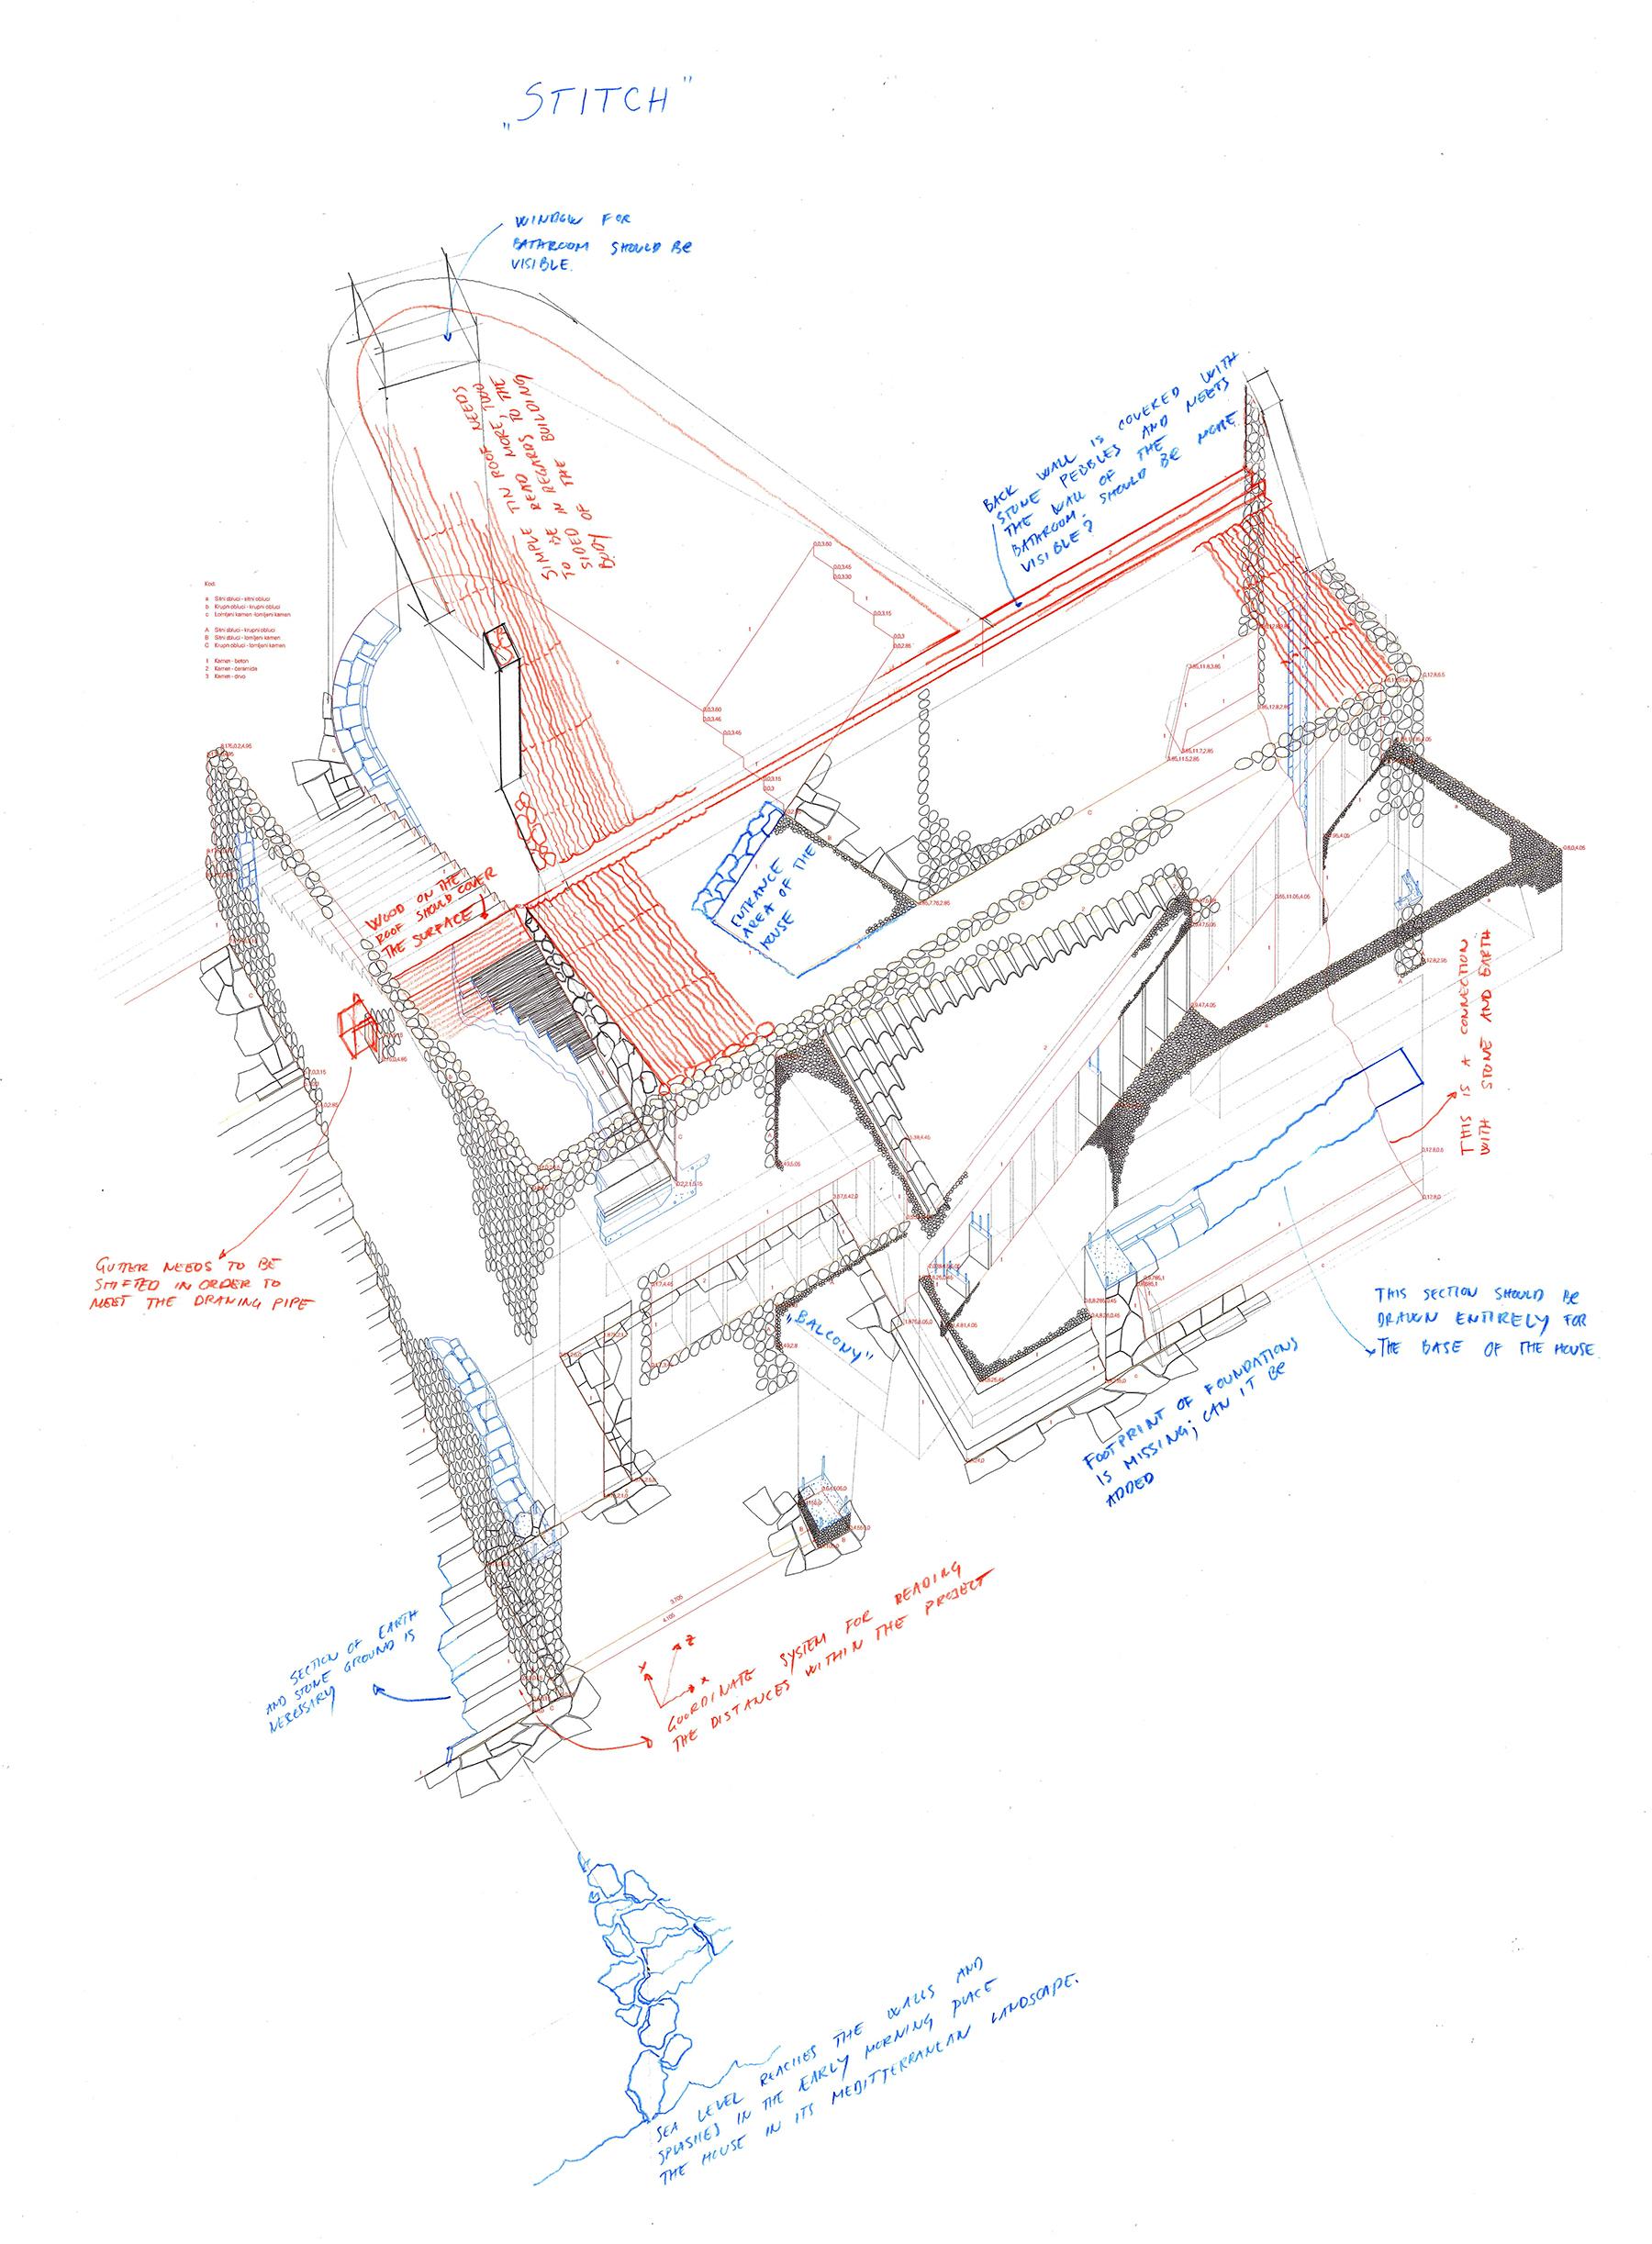 053 Ten Dobrovic Stitch Student Jana Kulic With Annotations By Nemanja Zimonjic With Ljiljana Blagojevic And Milica Lopicic Drawing Workshop 2017